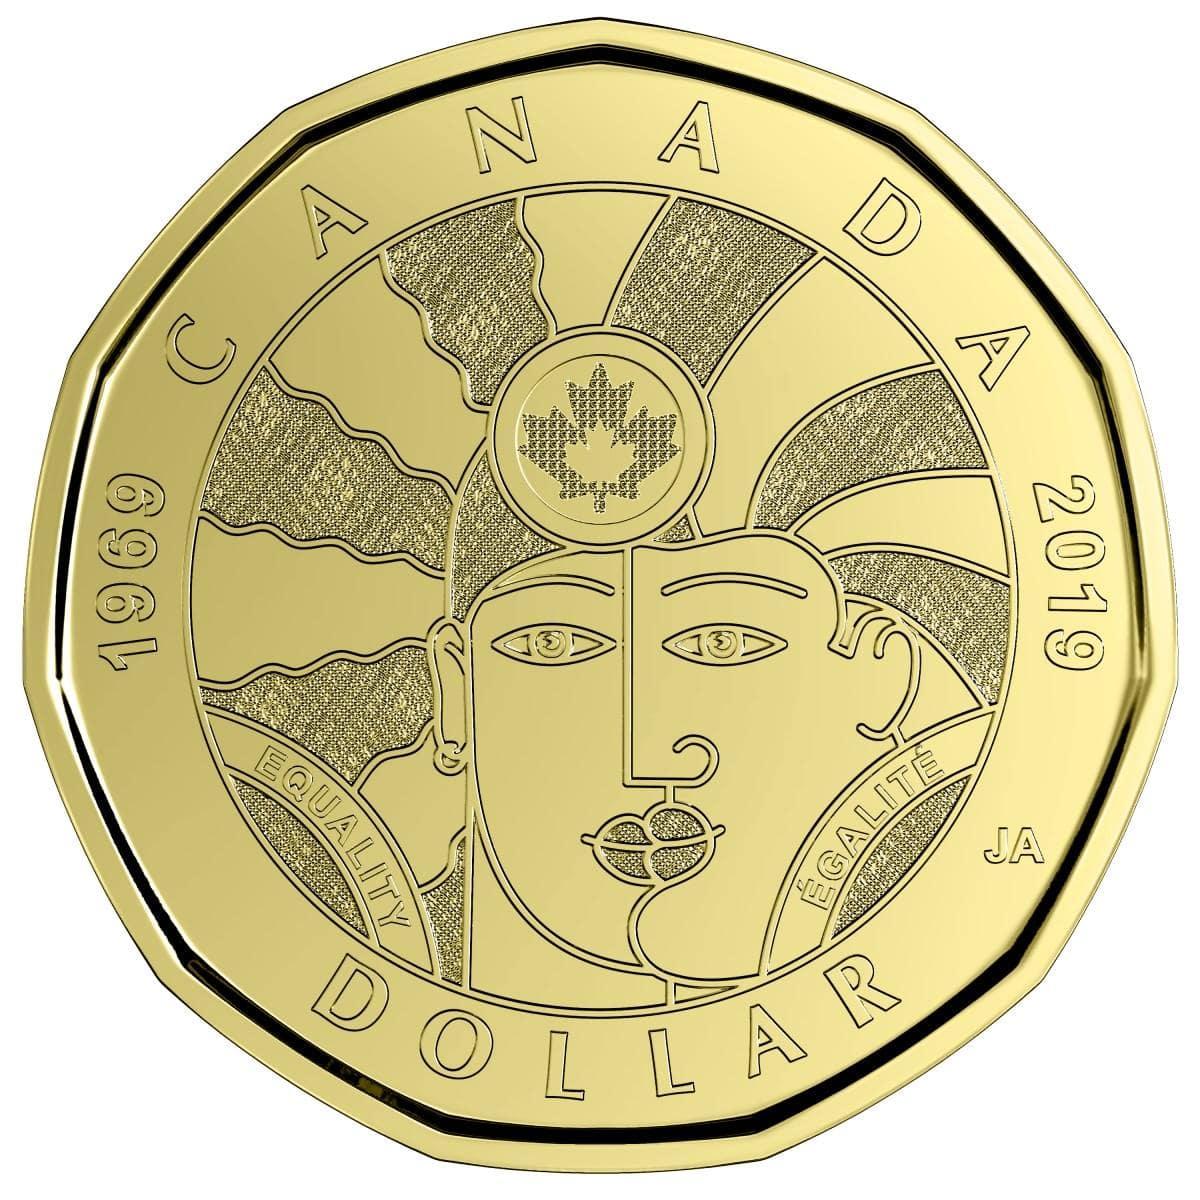 LGBTQ2記念デザインの1ドル硬貨「平等(Equality)」(画像提供=Royal Canadian Mint)